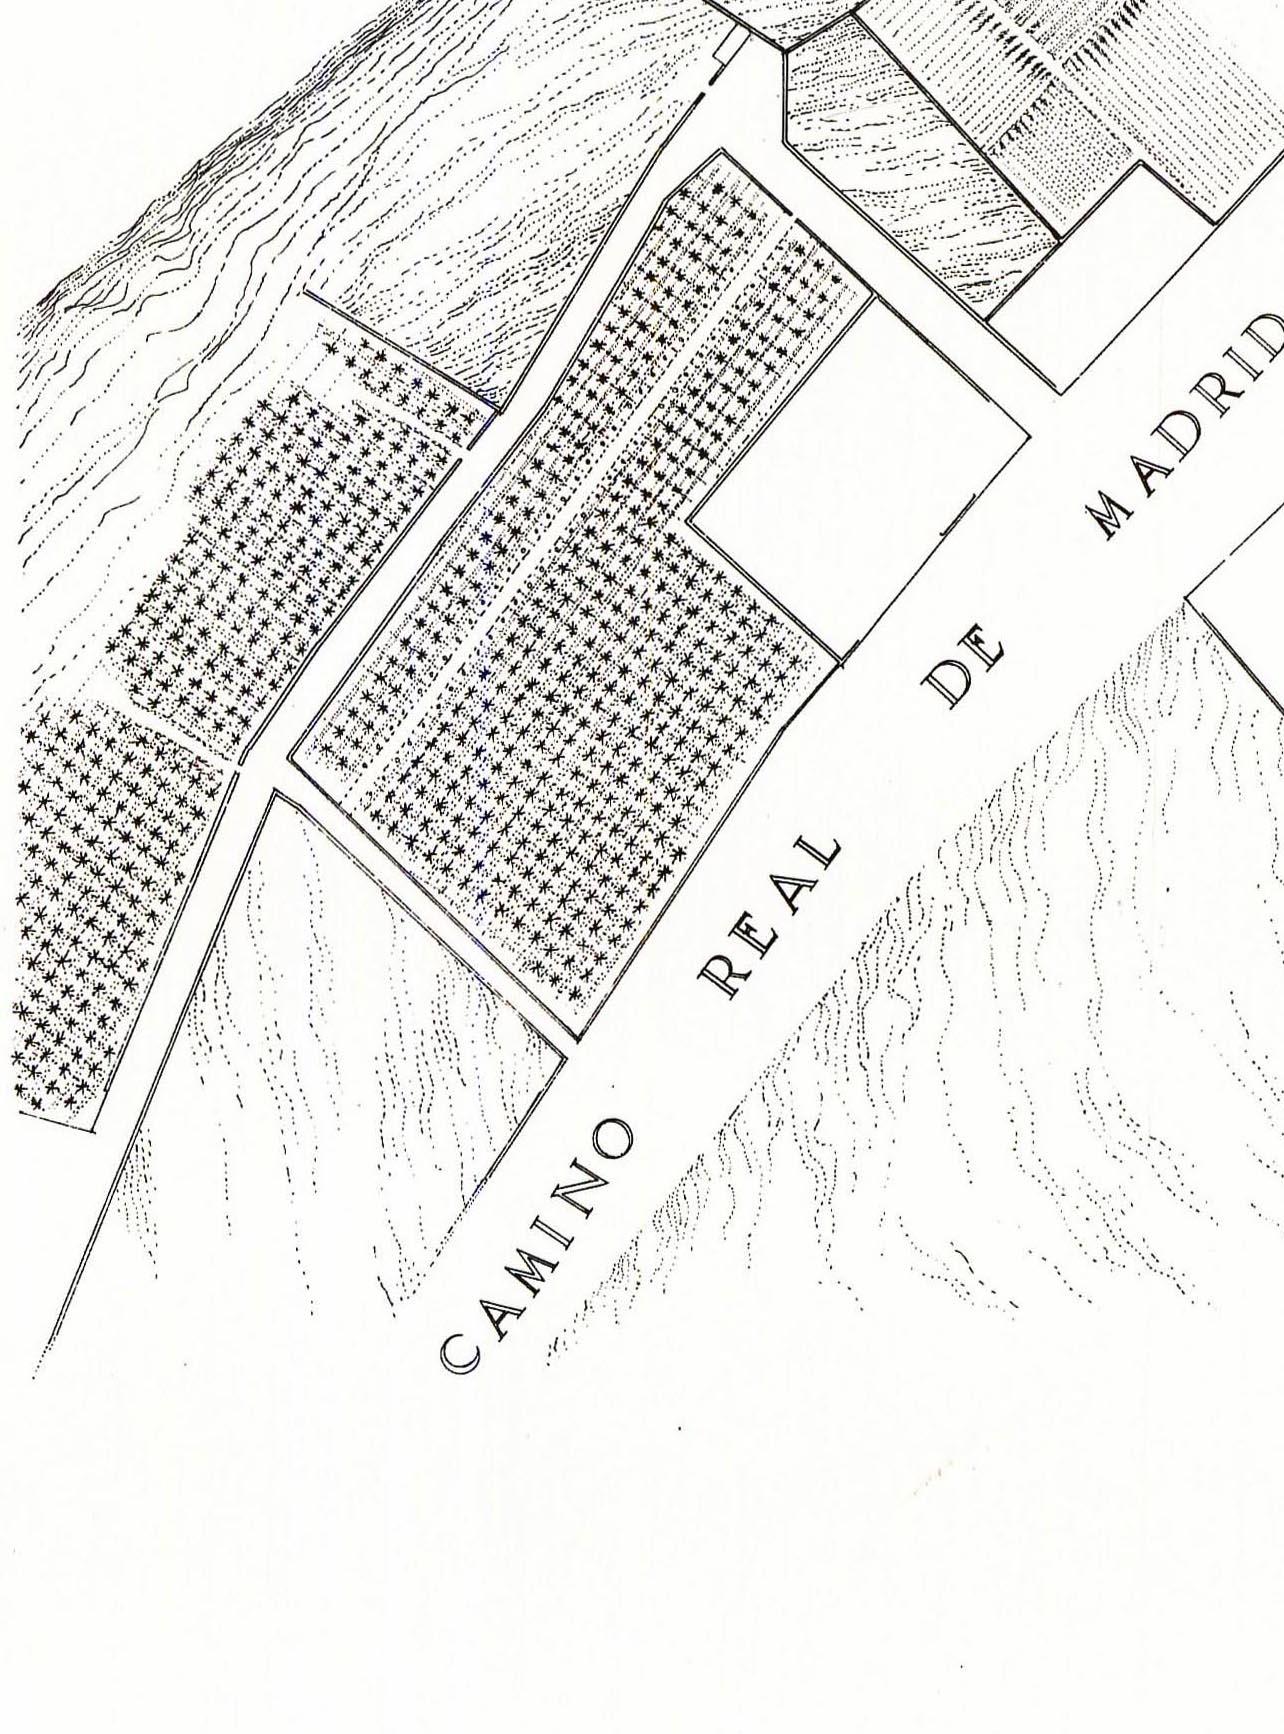 danielvillalobos-valladolid-blueprints-renaissance-h.2